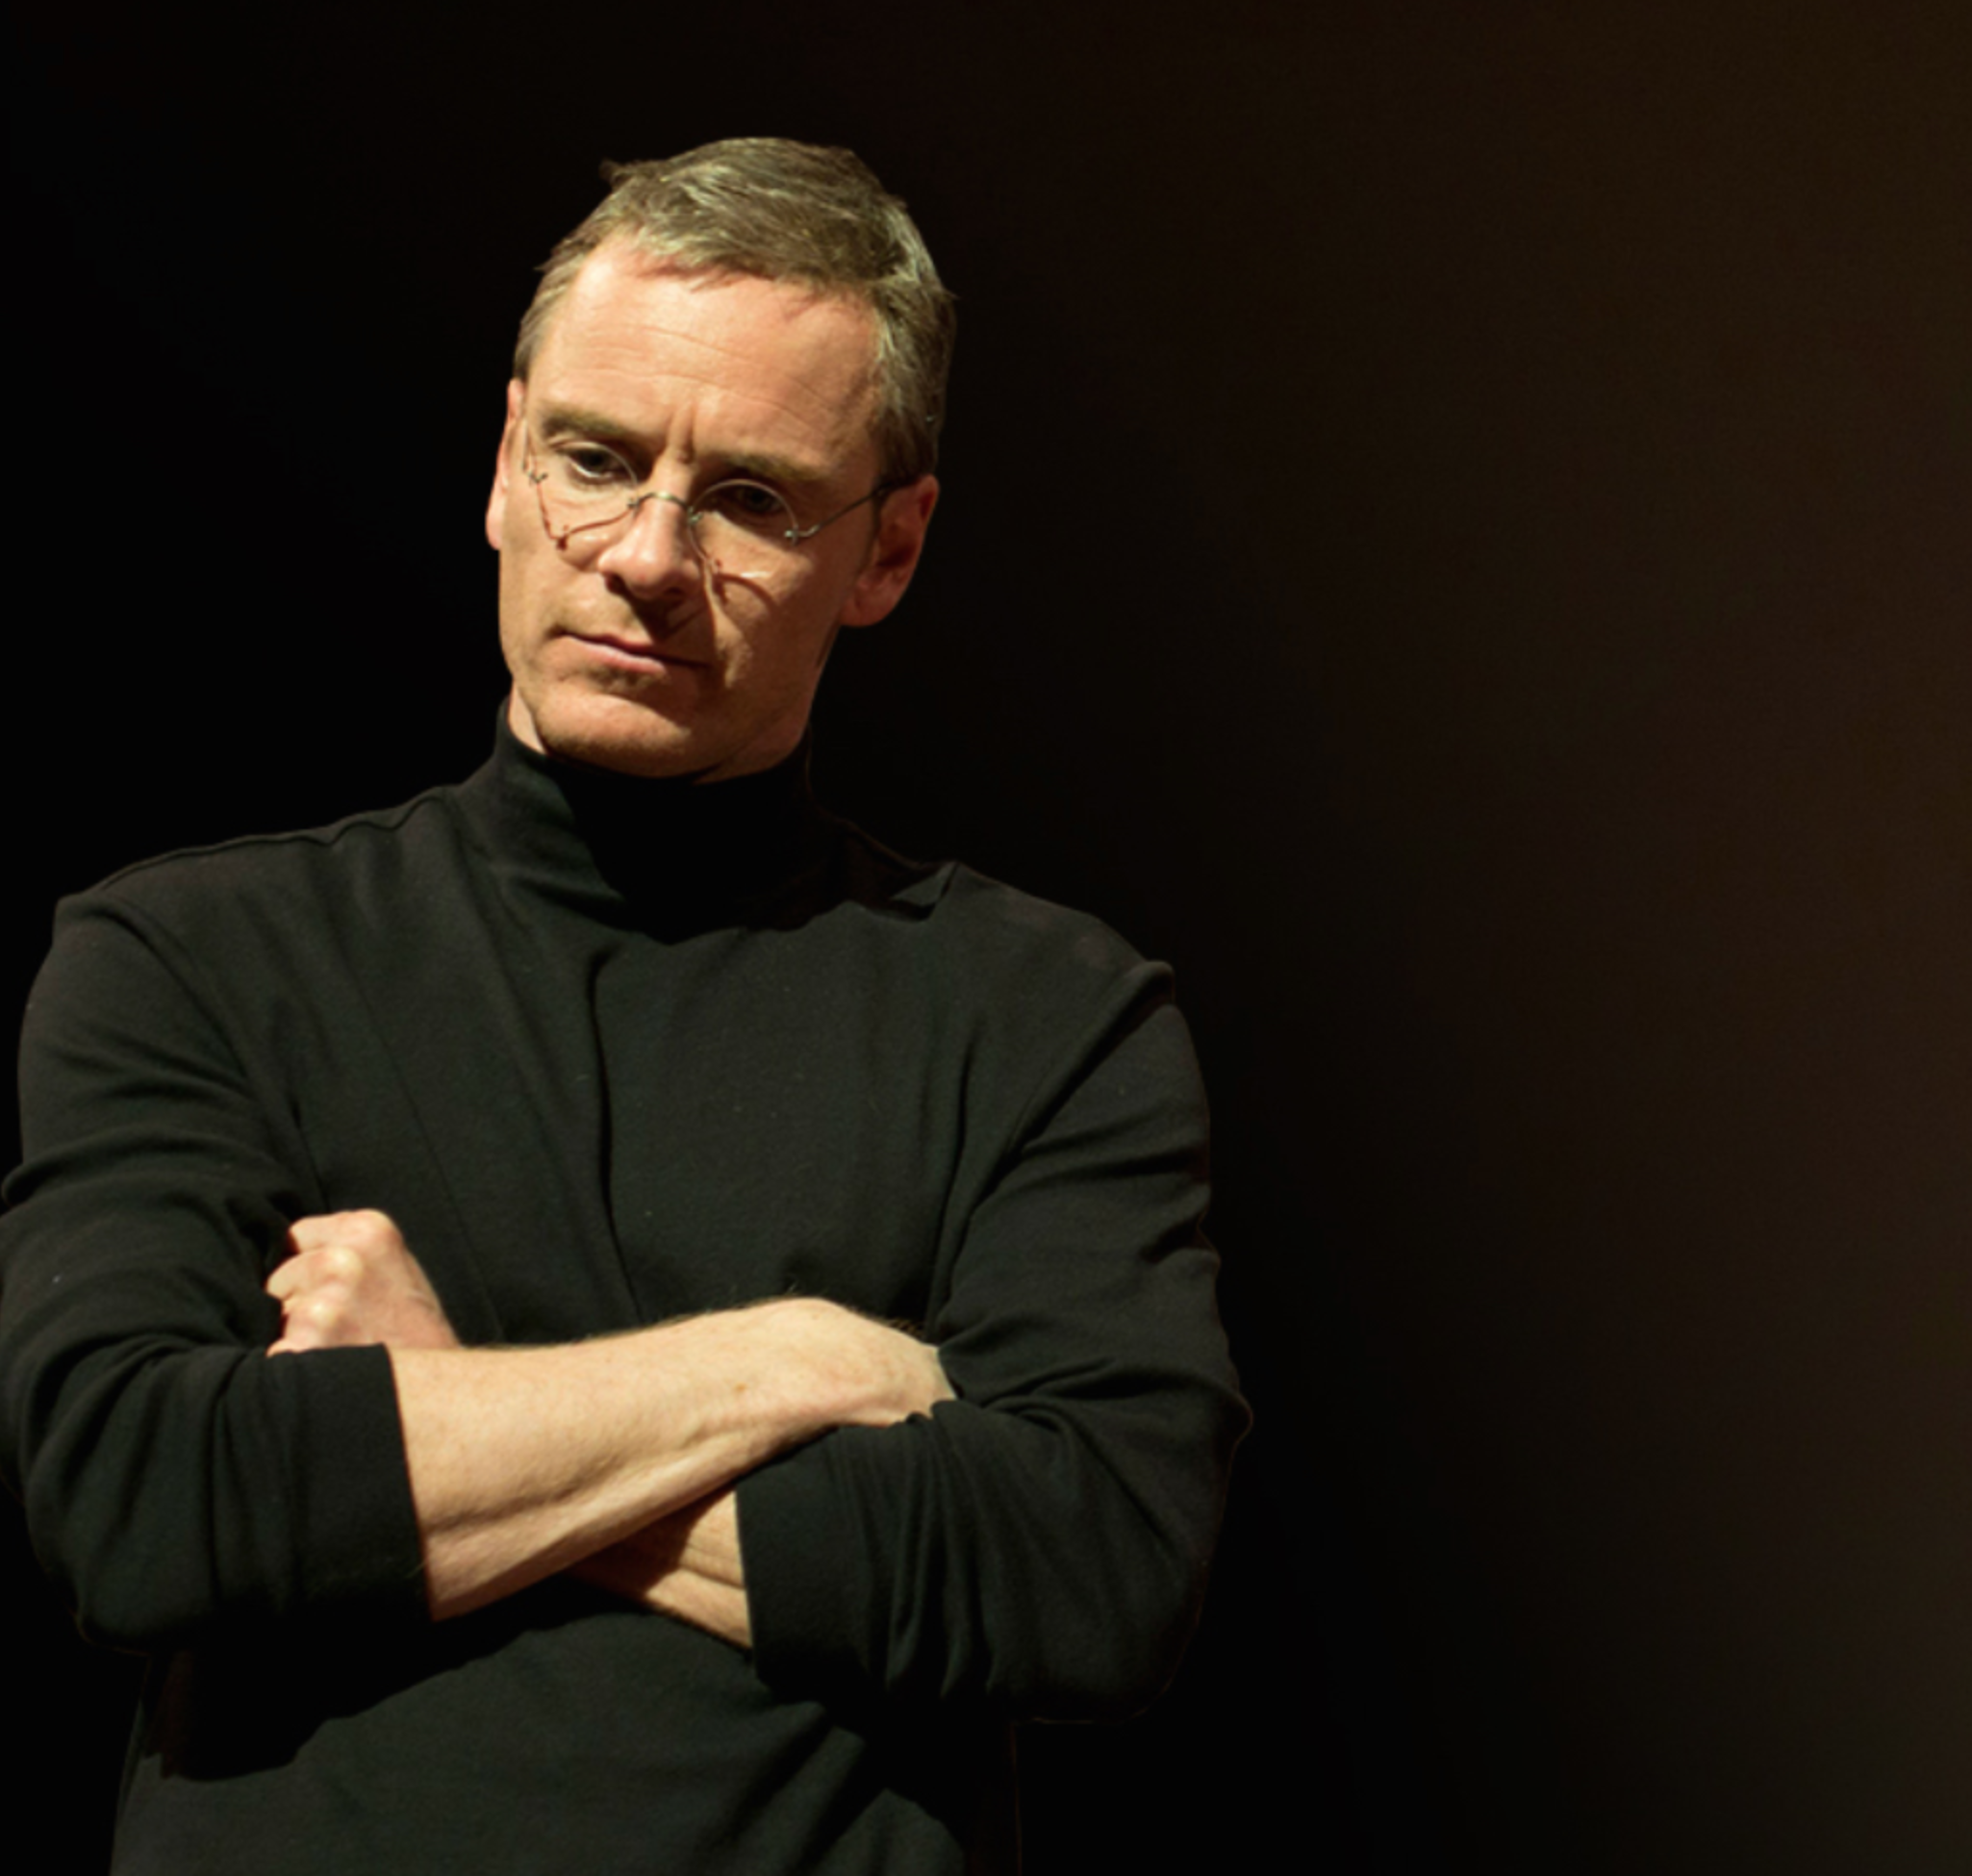 Steve Jobs – Film bei iTunes vorbestellen.